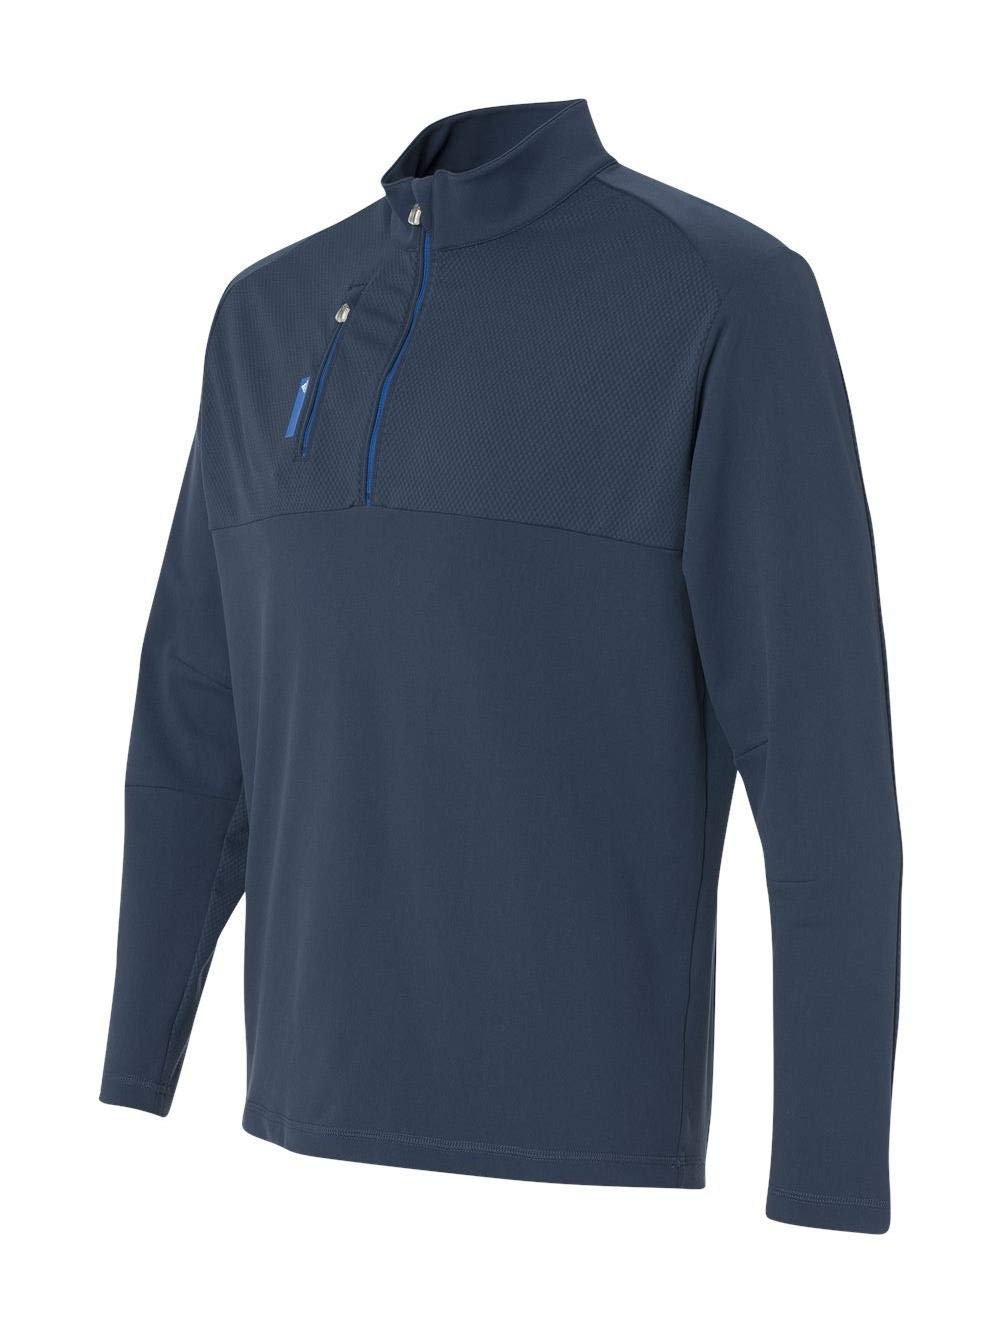 adidas Golf Mens Puremotion Mixed Media Quarter-Zip (A195) -Rich Blue/ -S